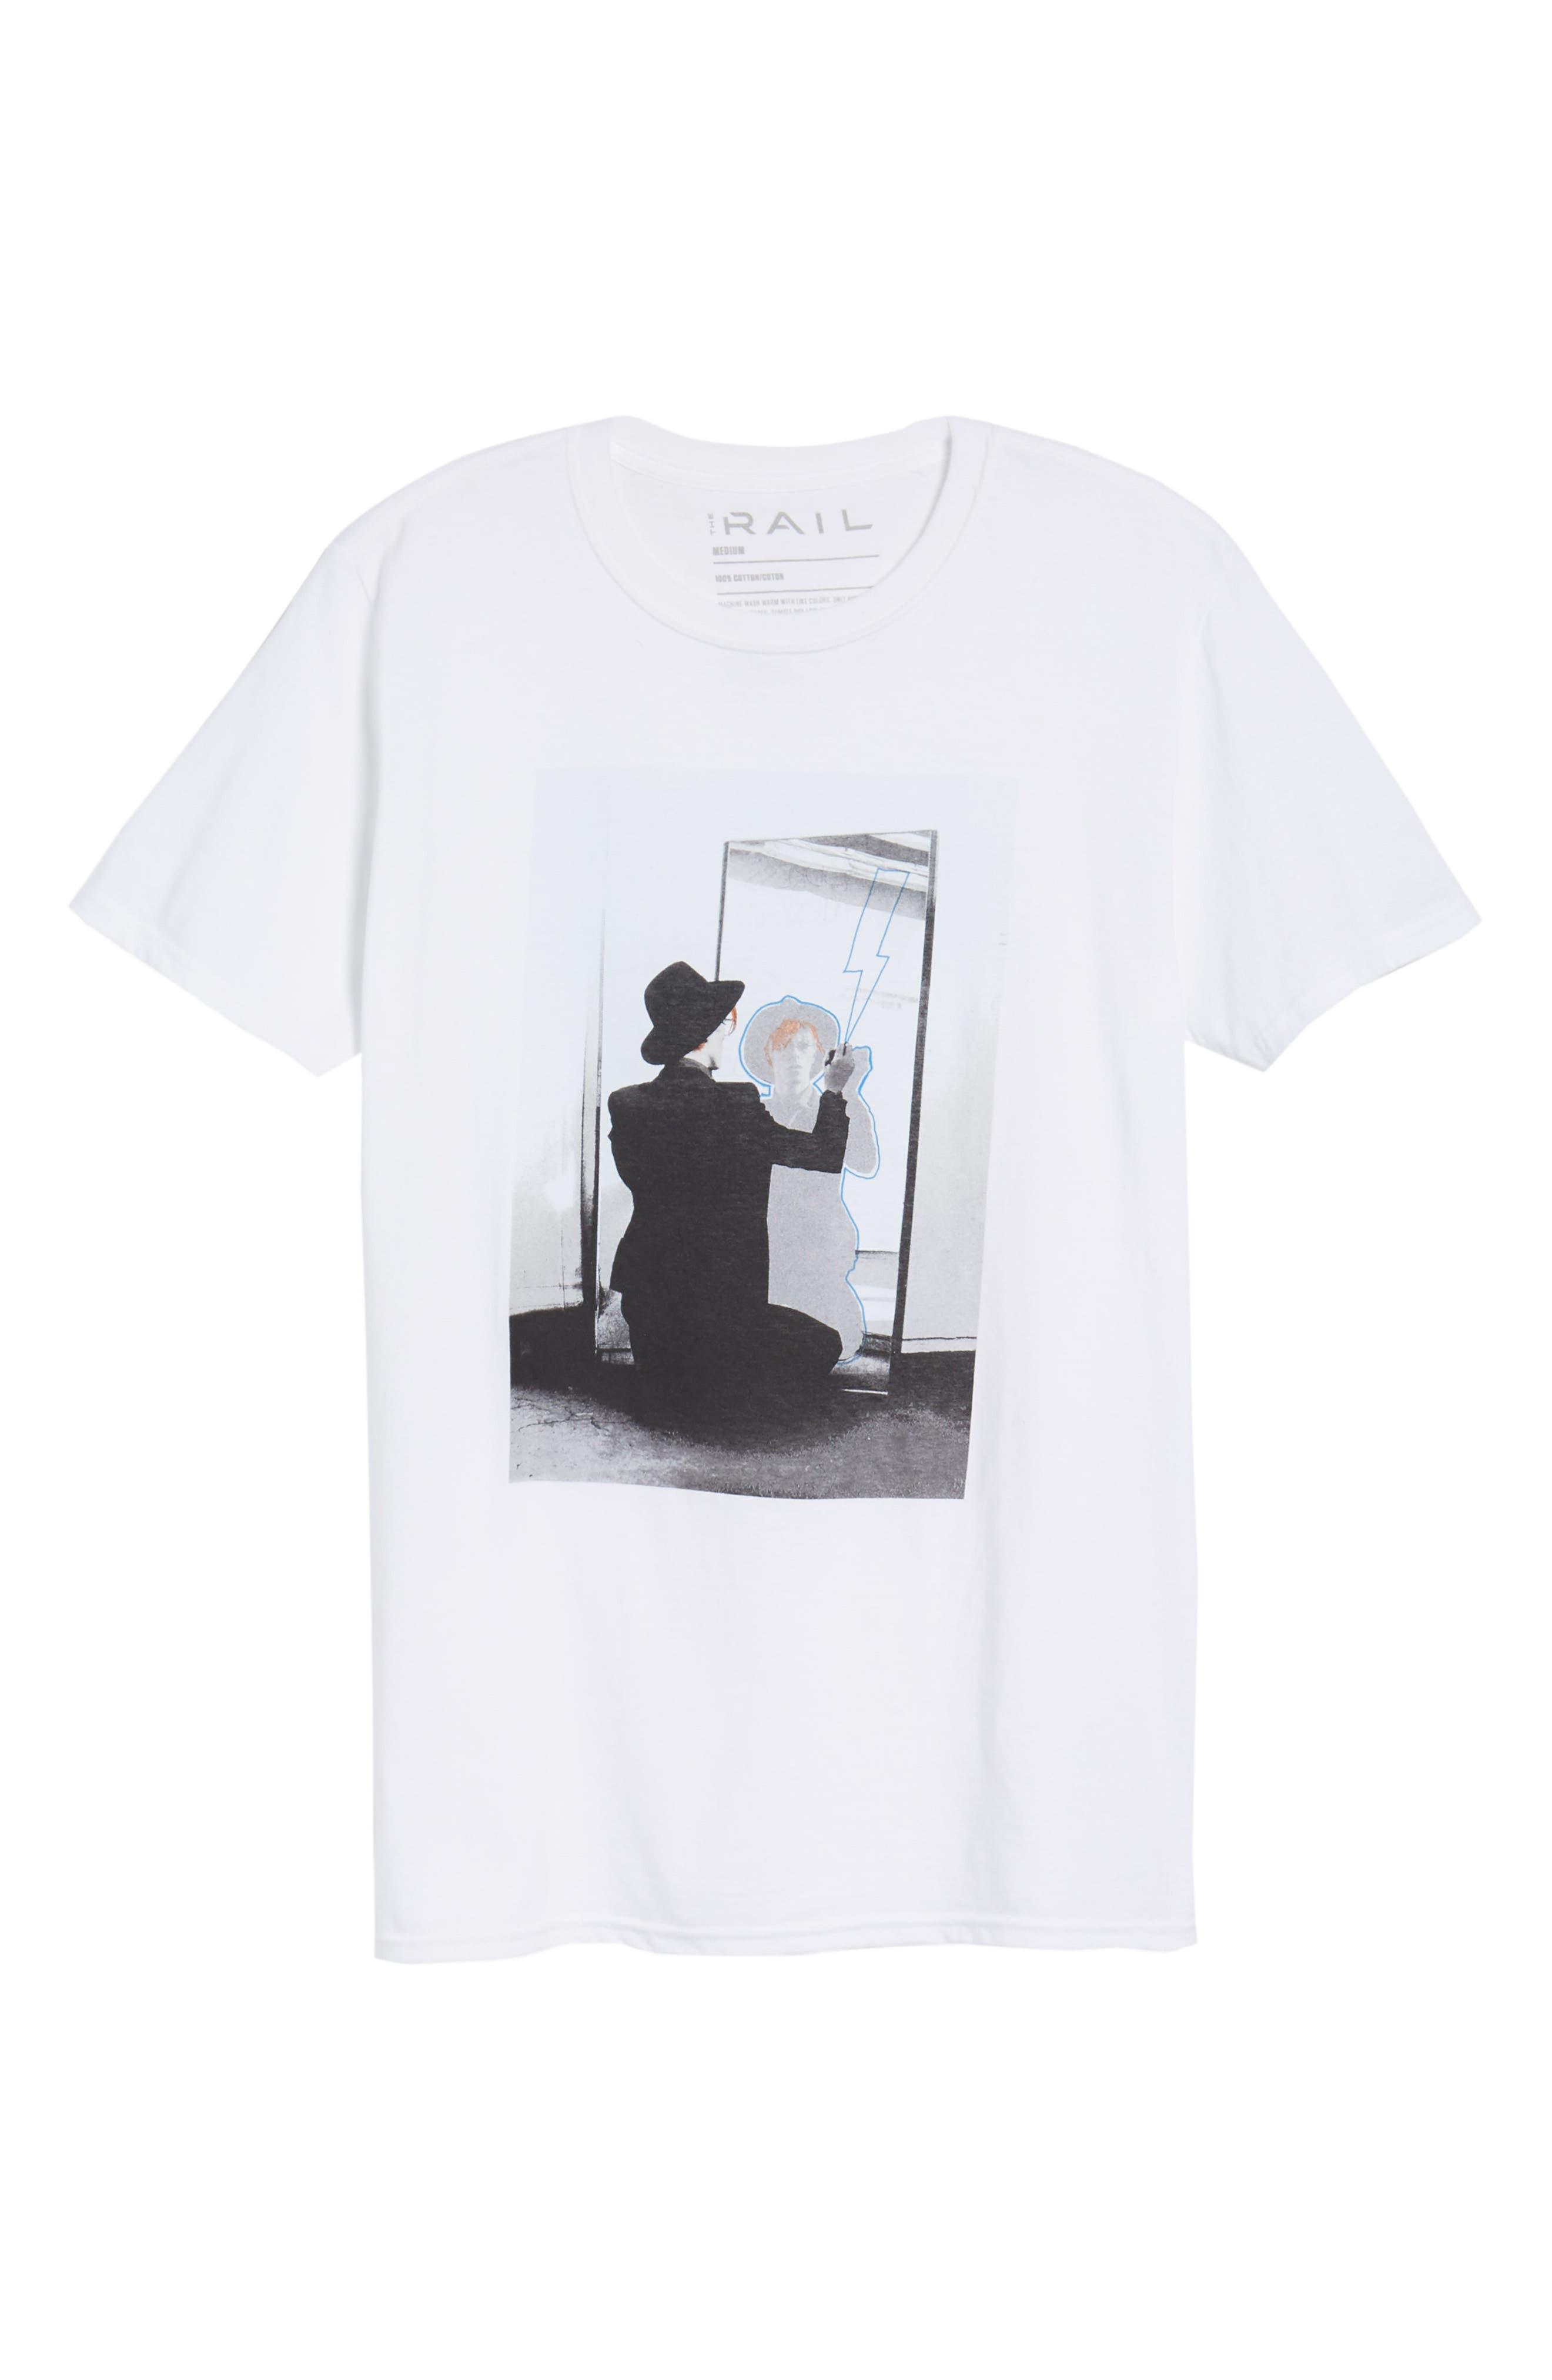 David Bowie Mirror T-Shirt,                             Alternate thumbnail 6, color,                             White Bowie Mirror